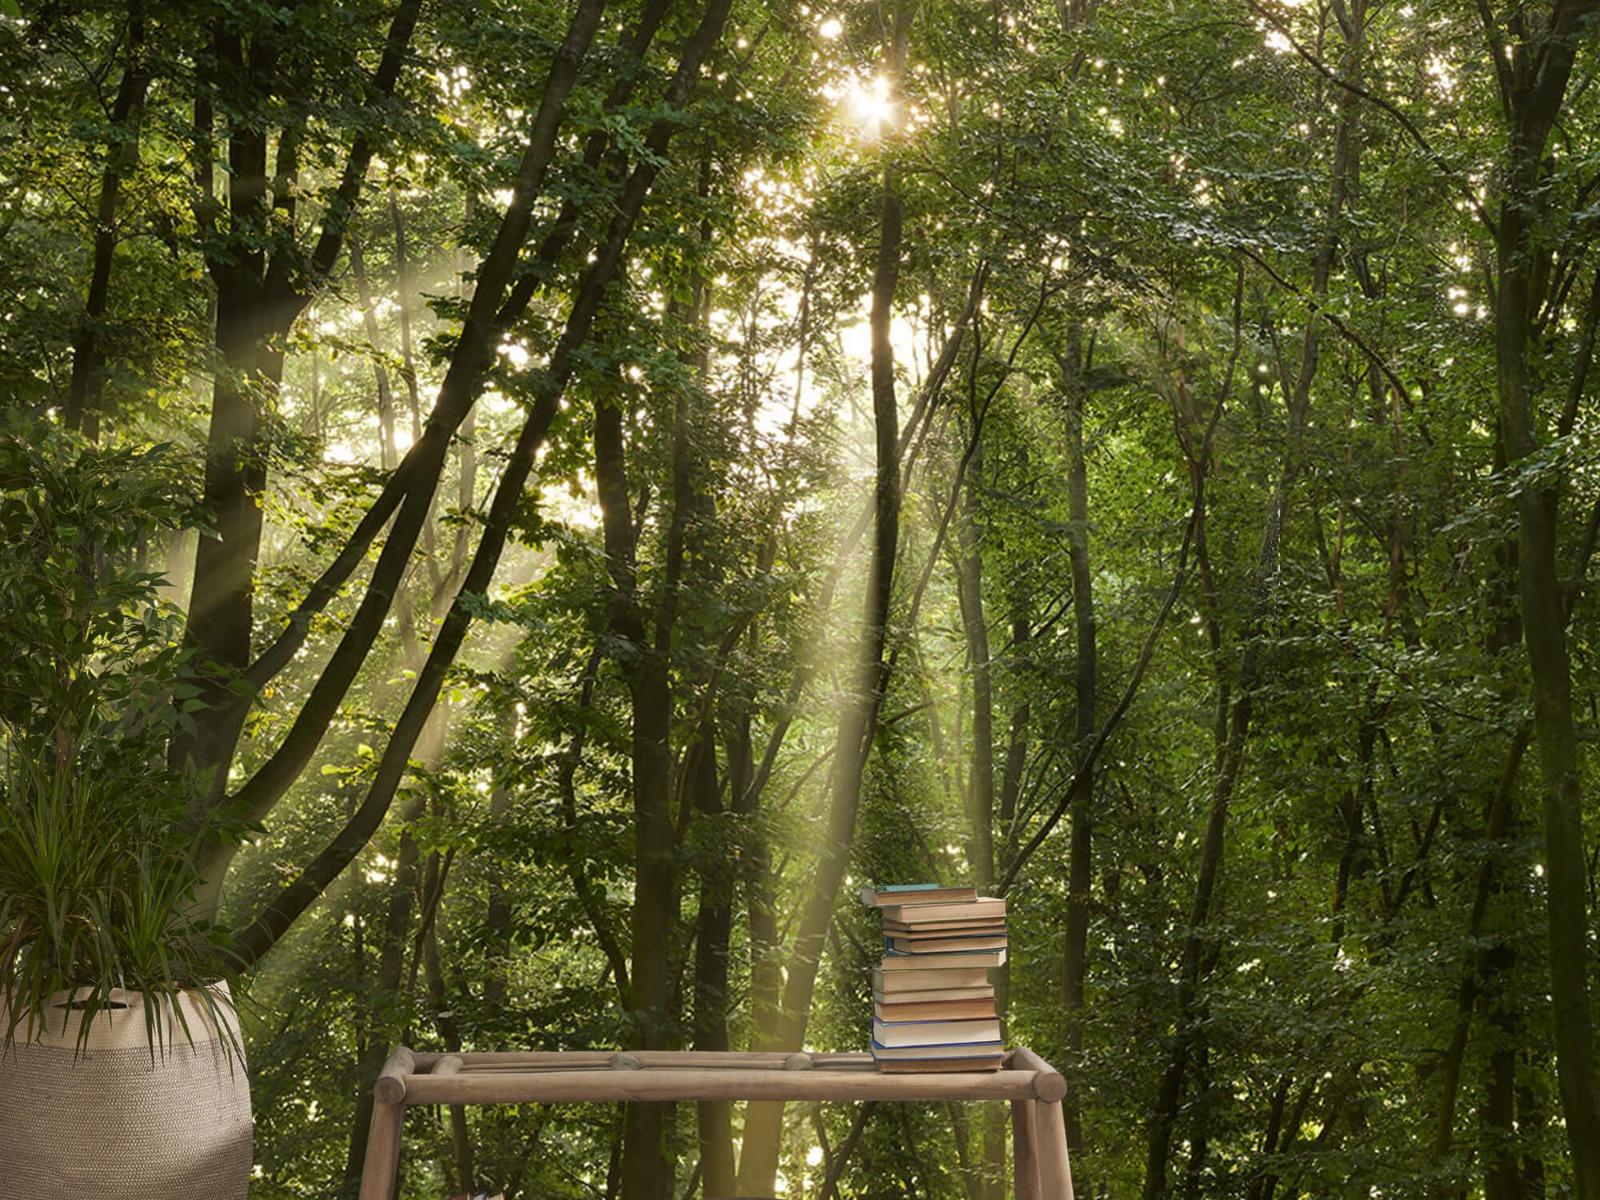 Bomen - Zonnestralen in het bos - Slaapkamer 20